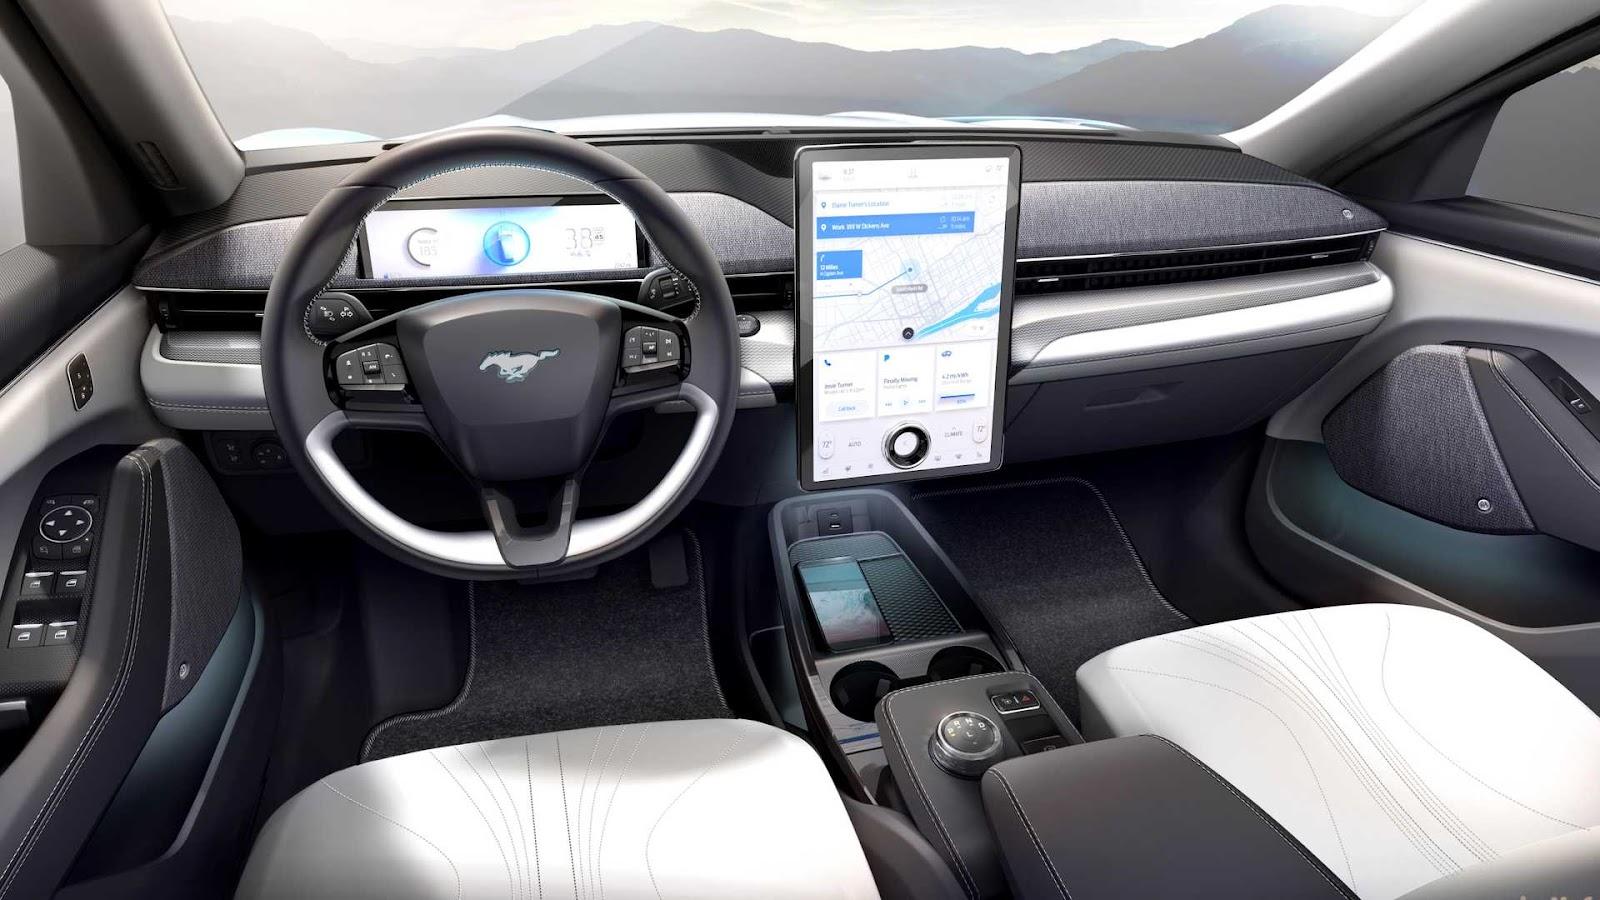 2020-ford-mustang-mach-e-9.jpg